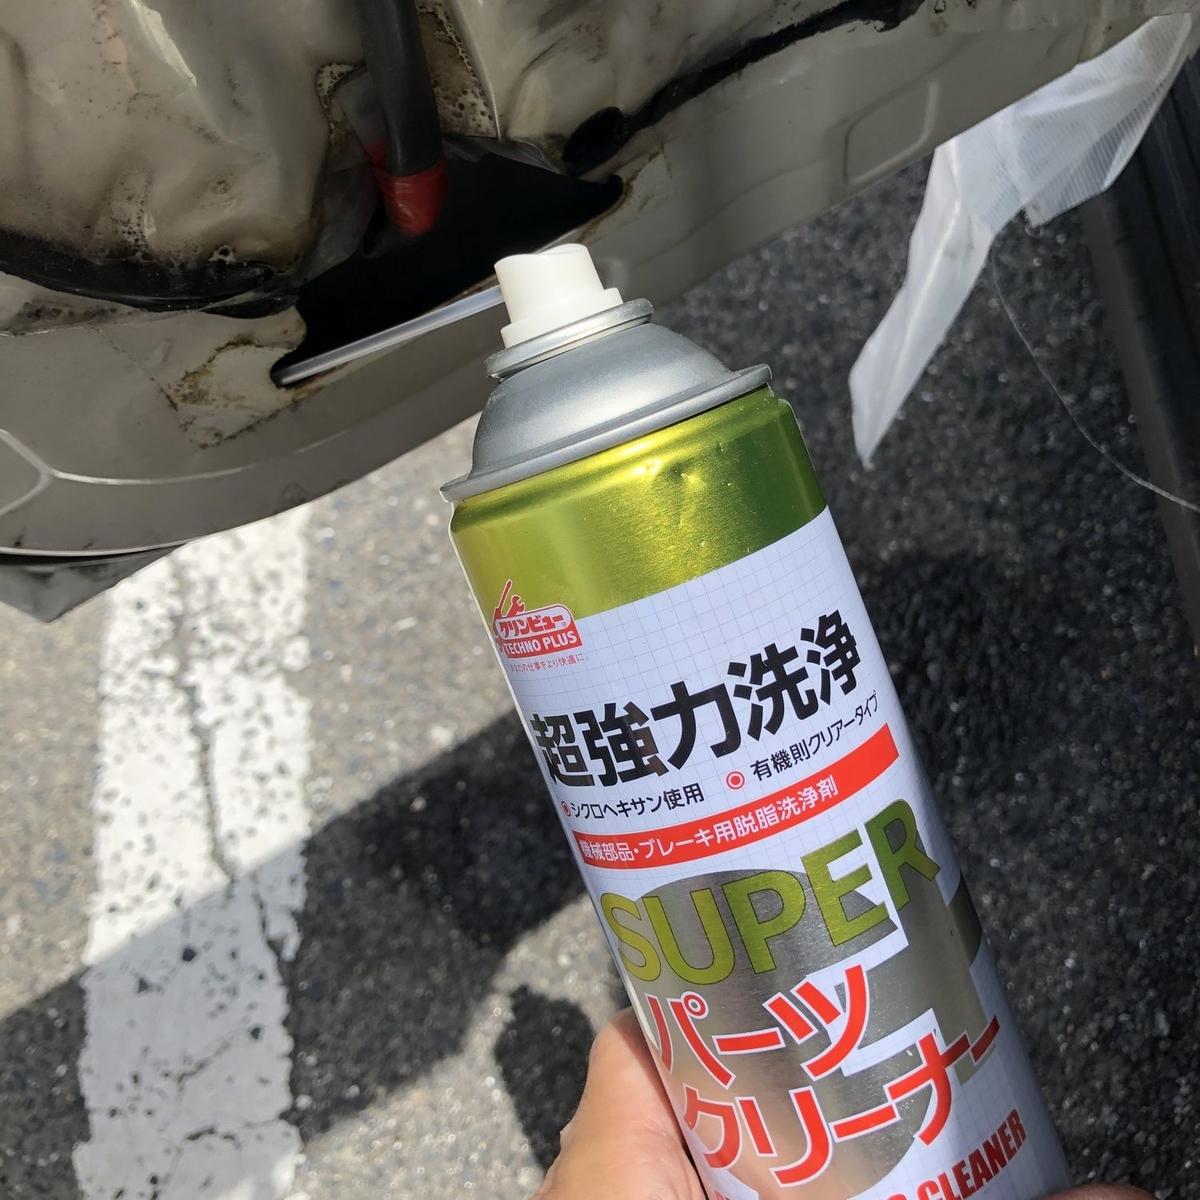 f:id:shiratsume:20200706172319j:plain